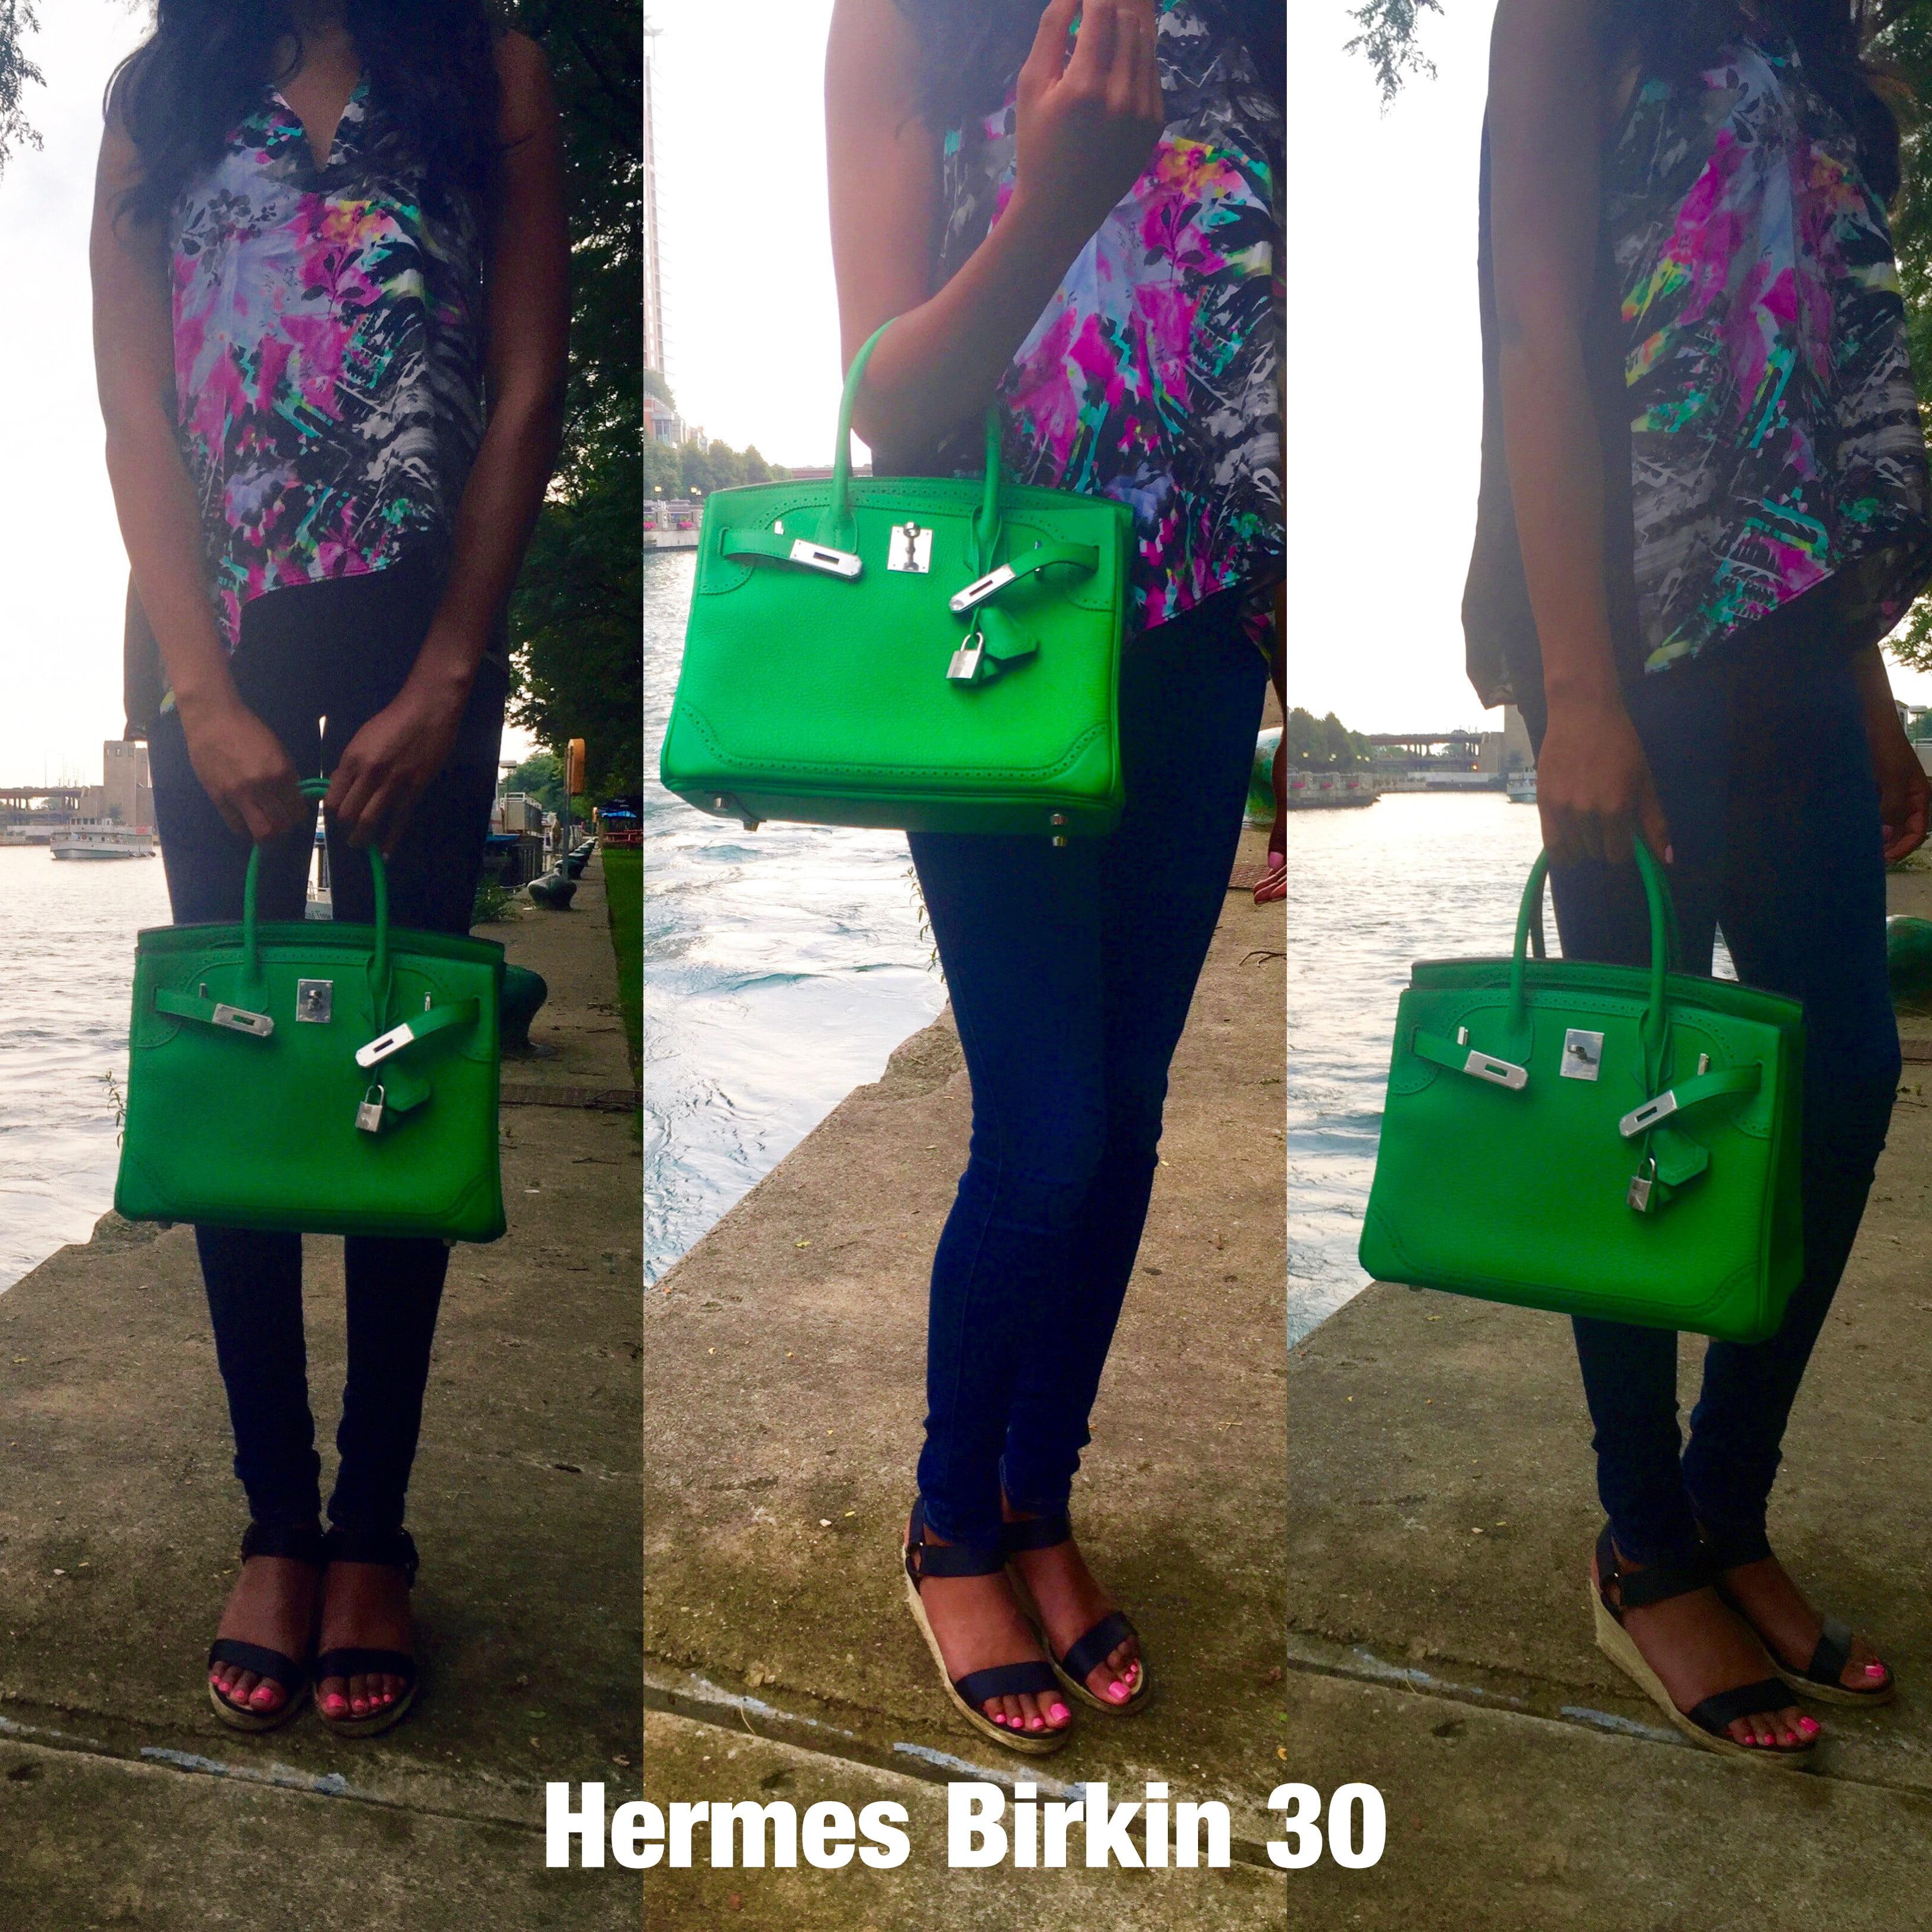 447d44ec713 Hermes Birkin Size Comparison - PurseBop